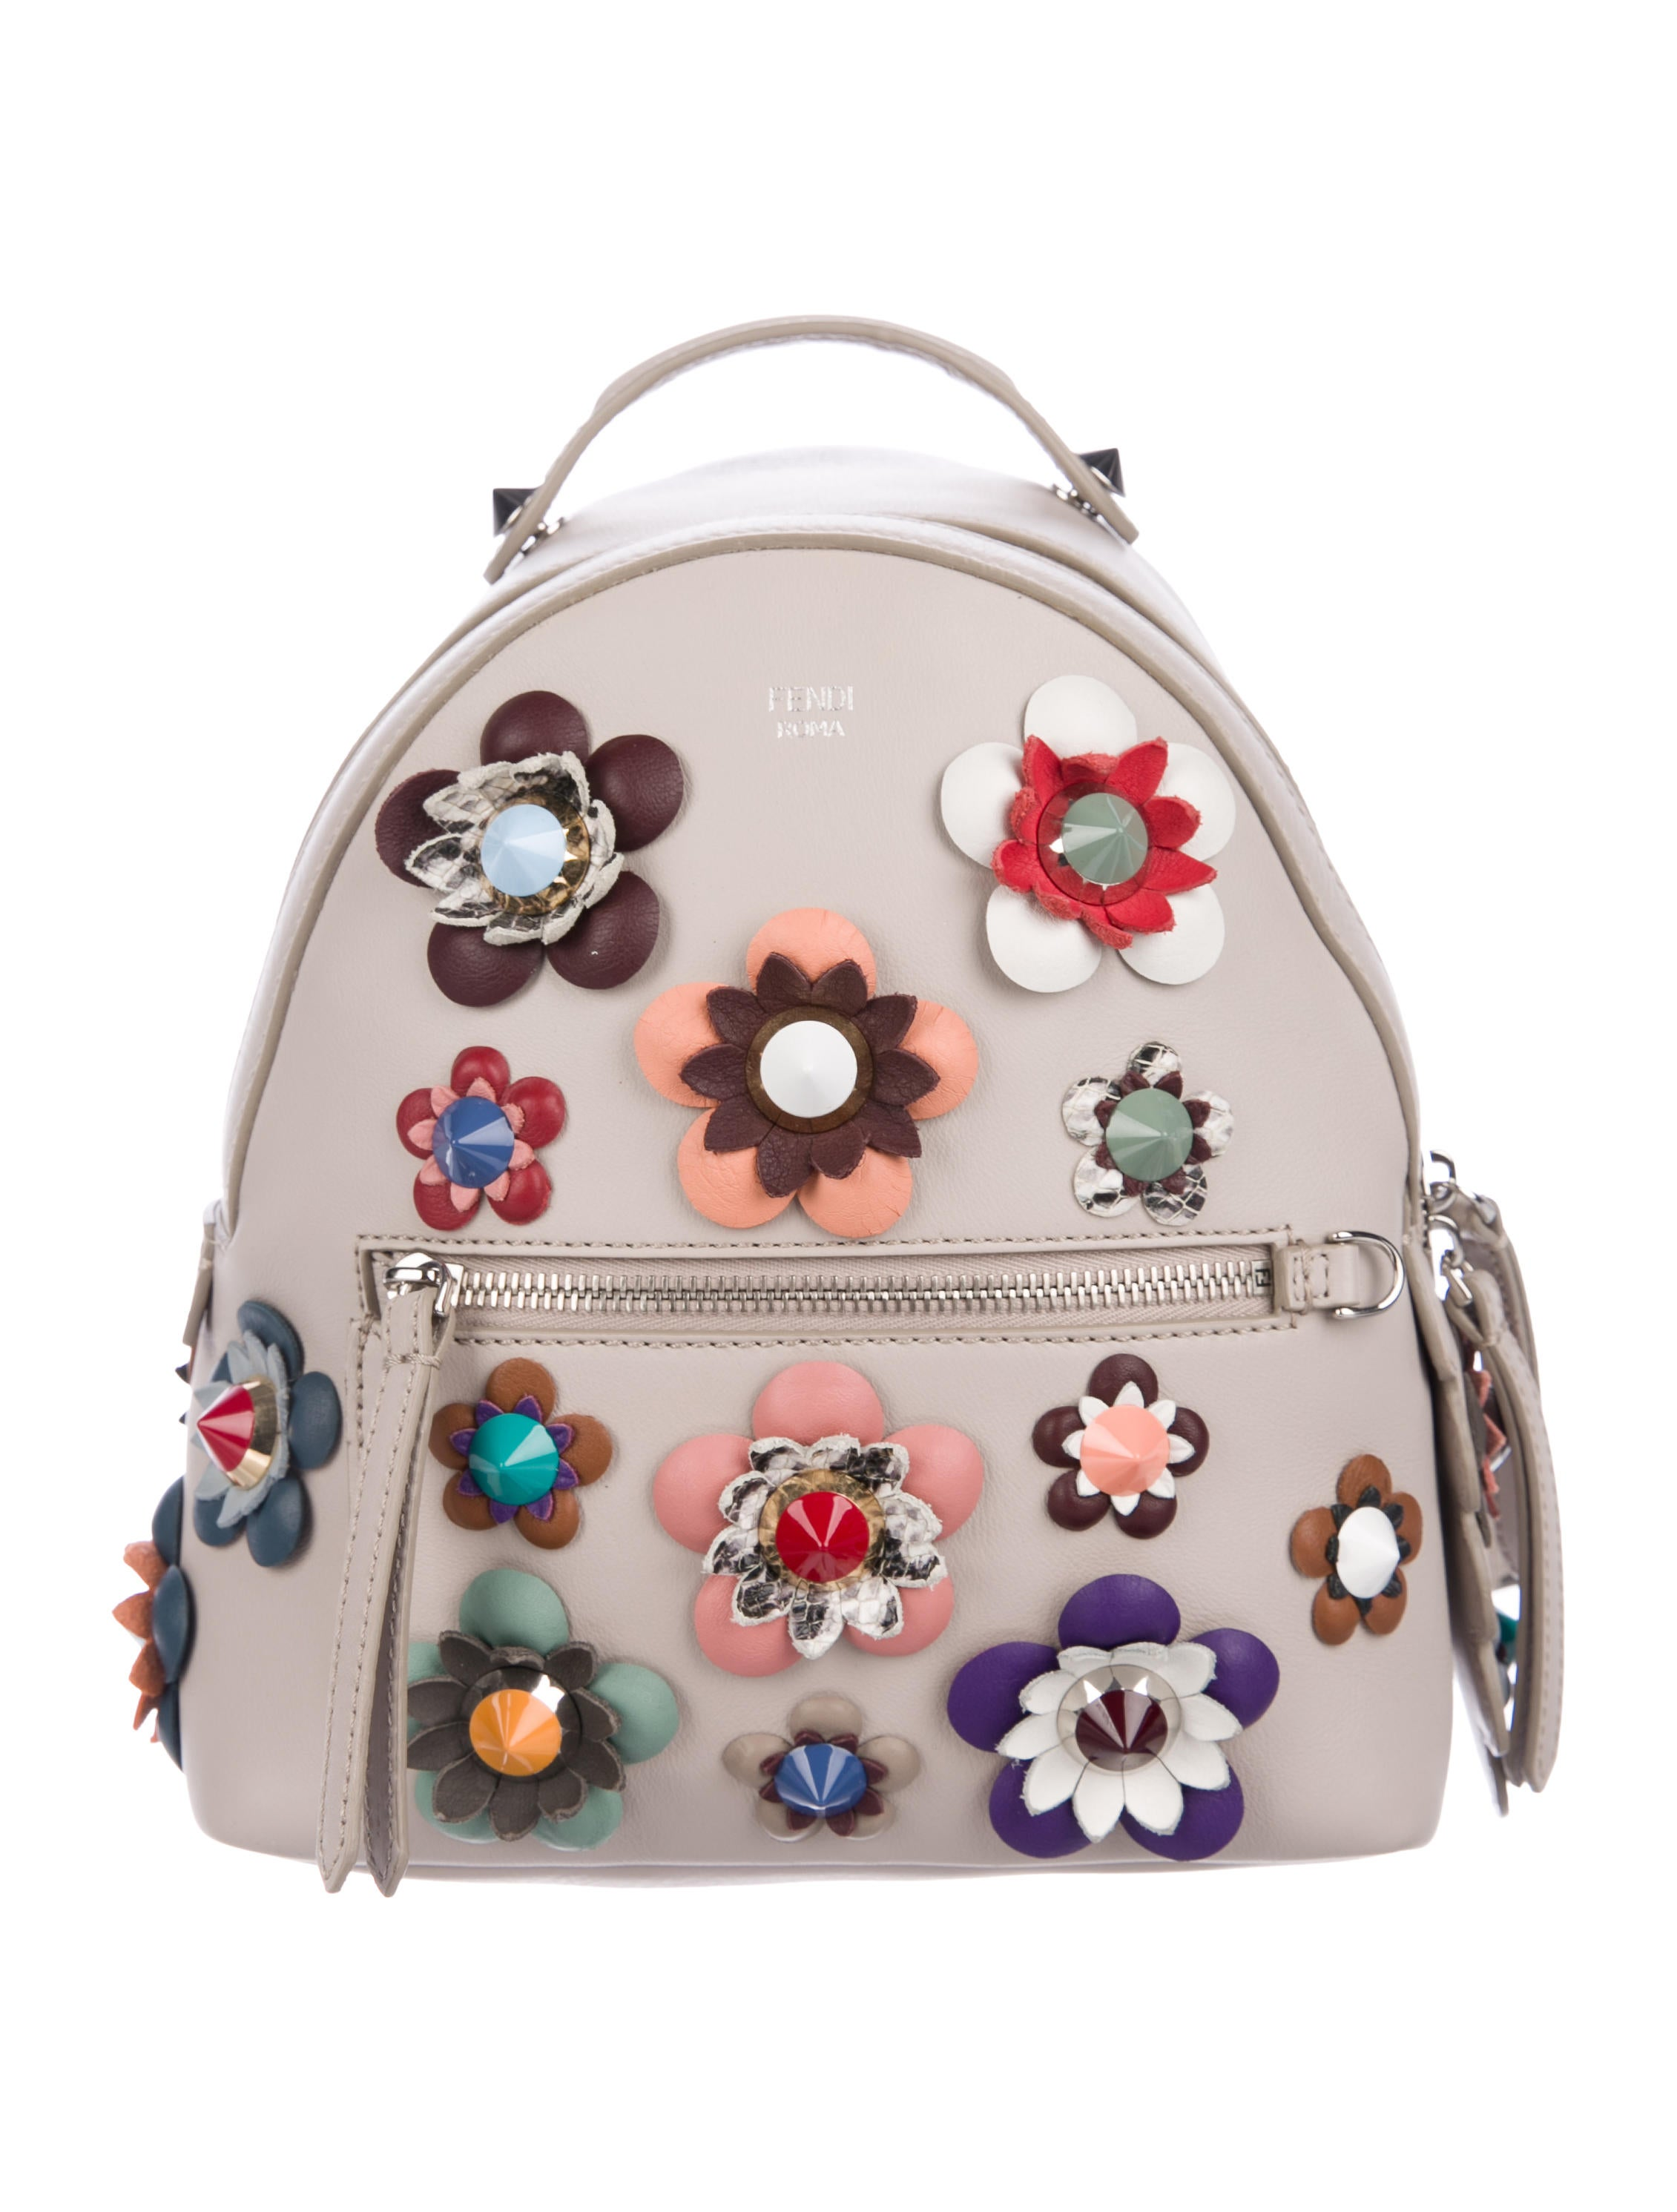 7bcd3bbffafb Fendi Mini Zaino Backpack - Handbags - FEN85195